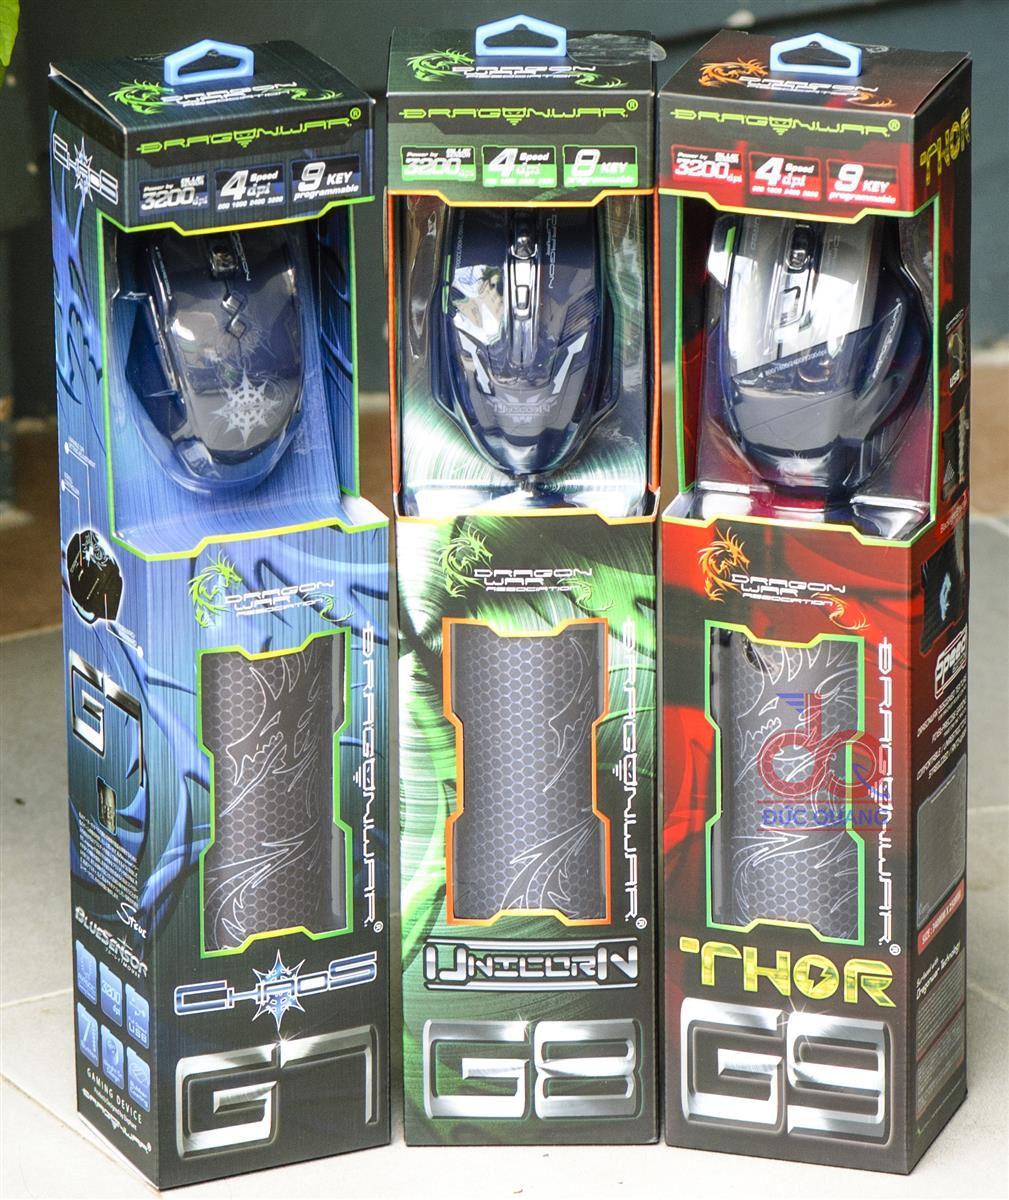 Dragon War Thor G9, G7, G8 chi co tai Duc Quang Solutions